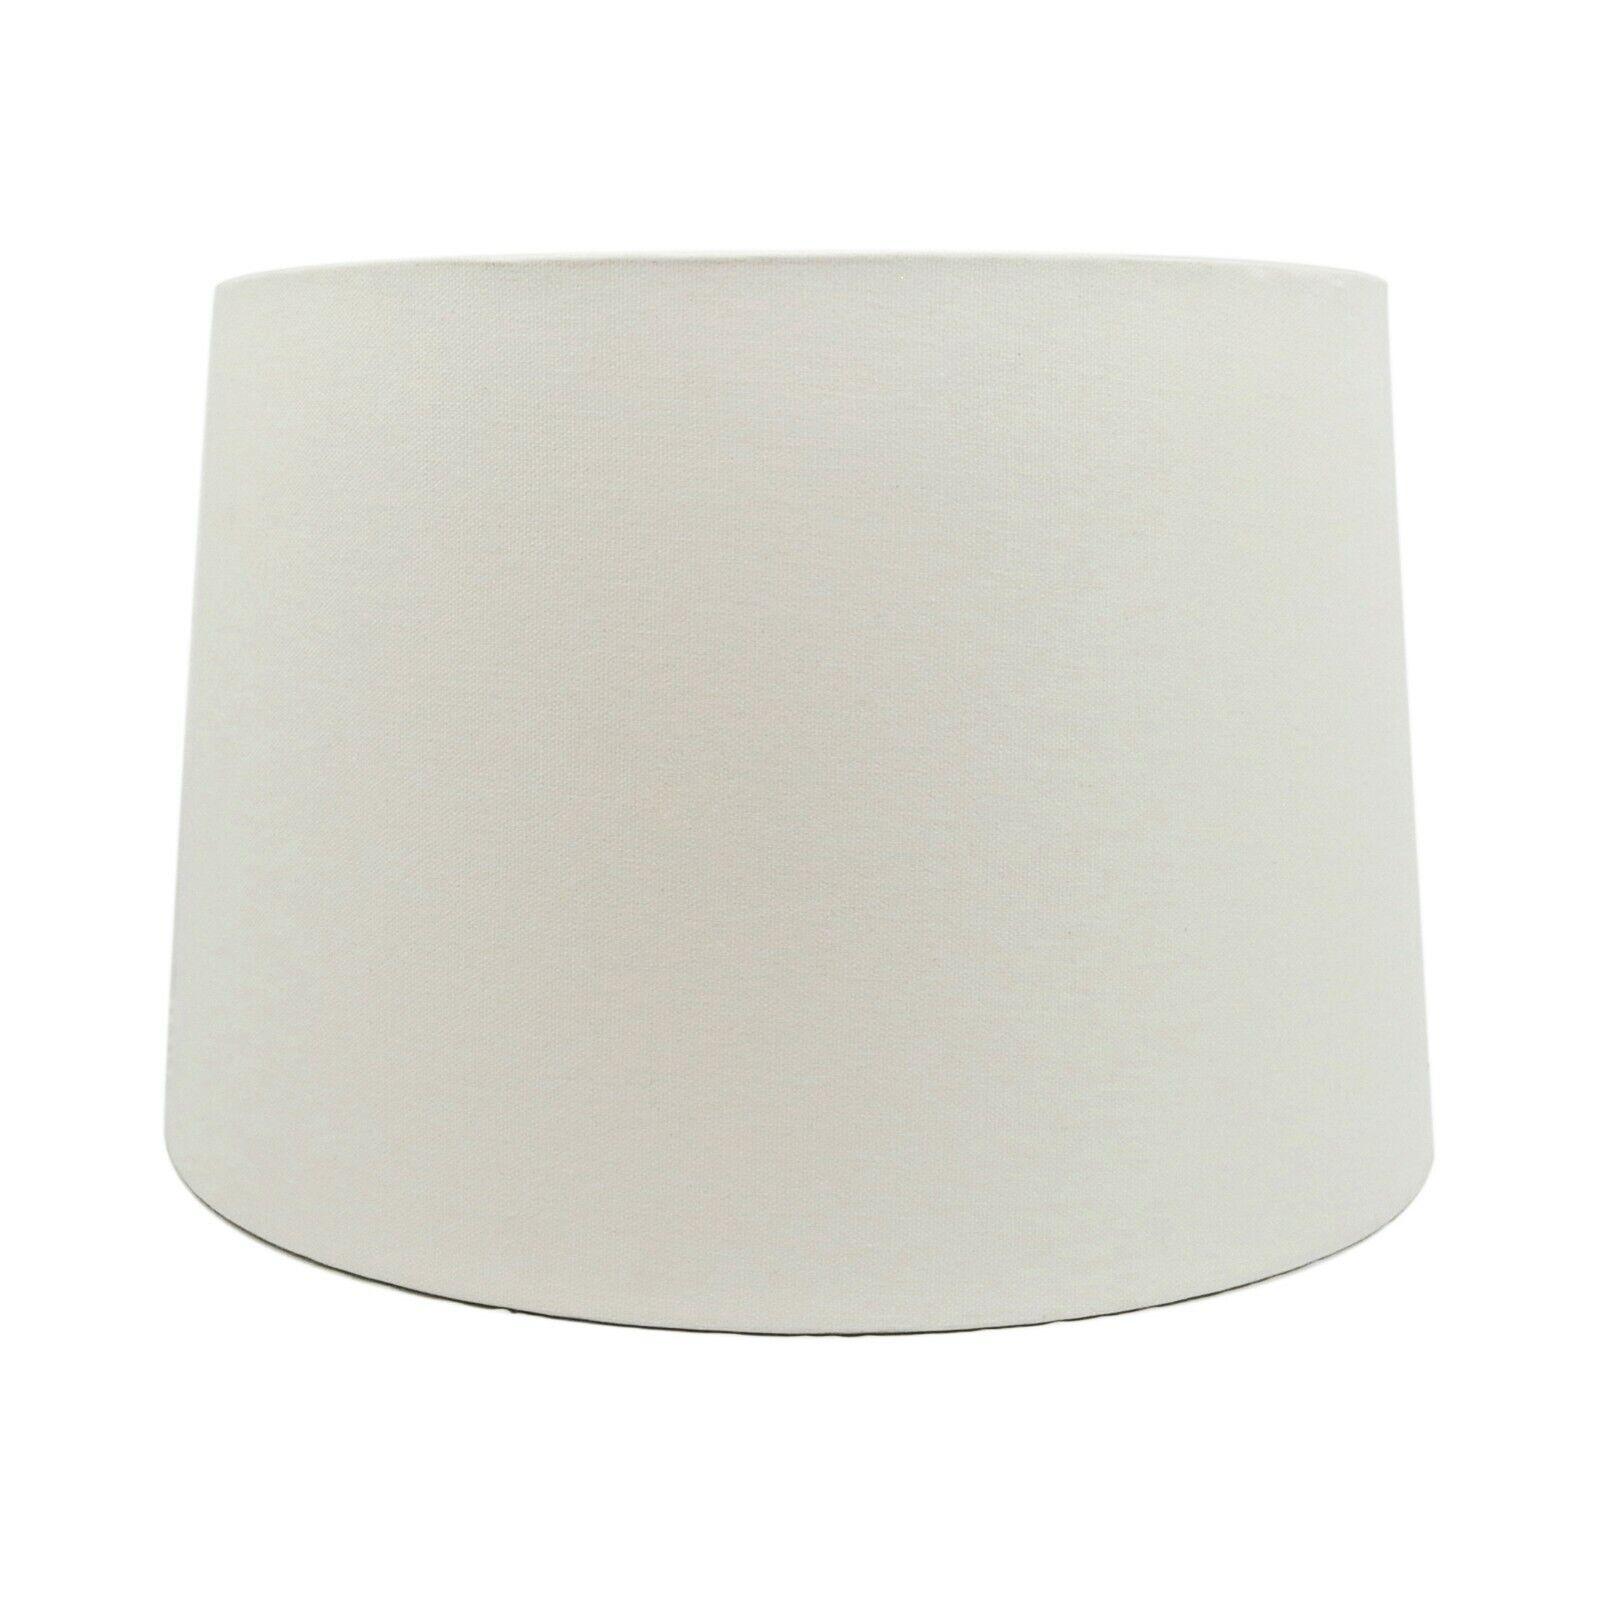 White Fabric Hardback Drum Lampshade for Table Lamp Floor La